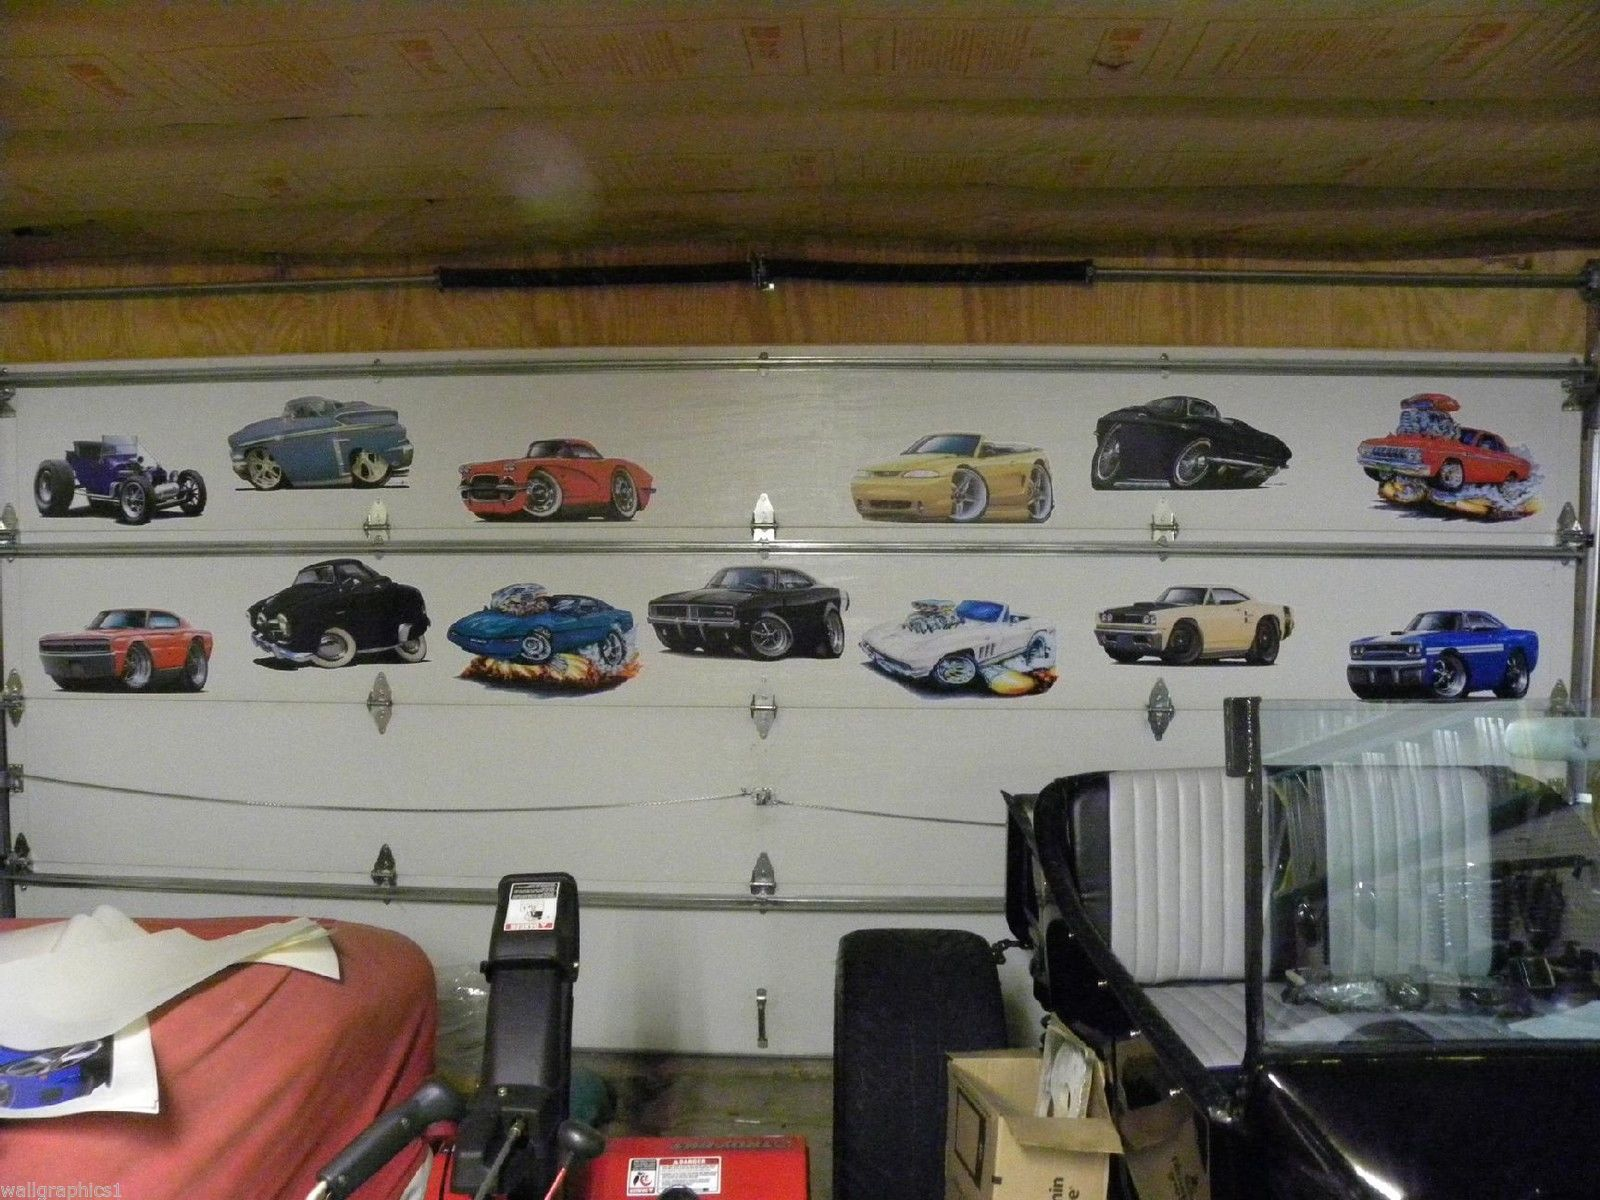 Garage Ford 95 : 1993 95 ford lightning svt truck wall graphics decals stickers man cave garage graphics decals ~ Gottalentnigeria.com Avis de Voitures